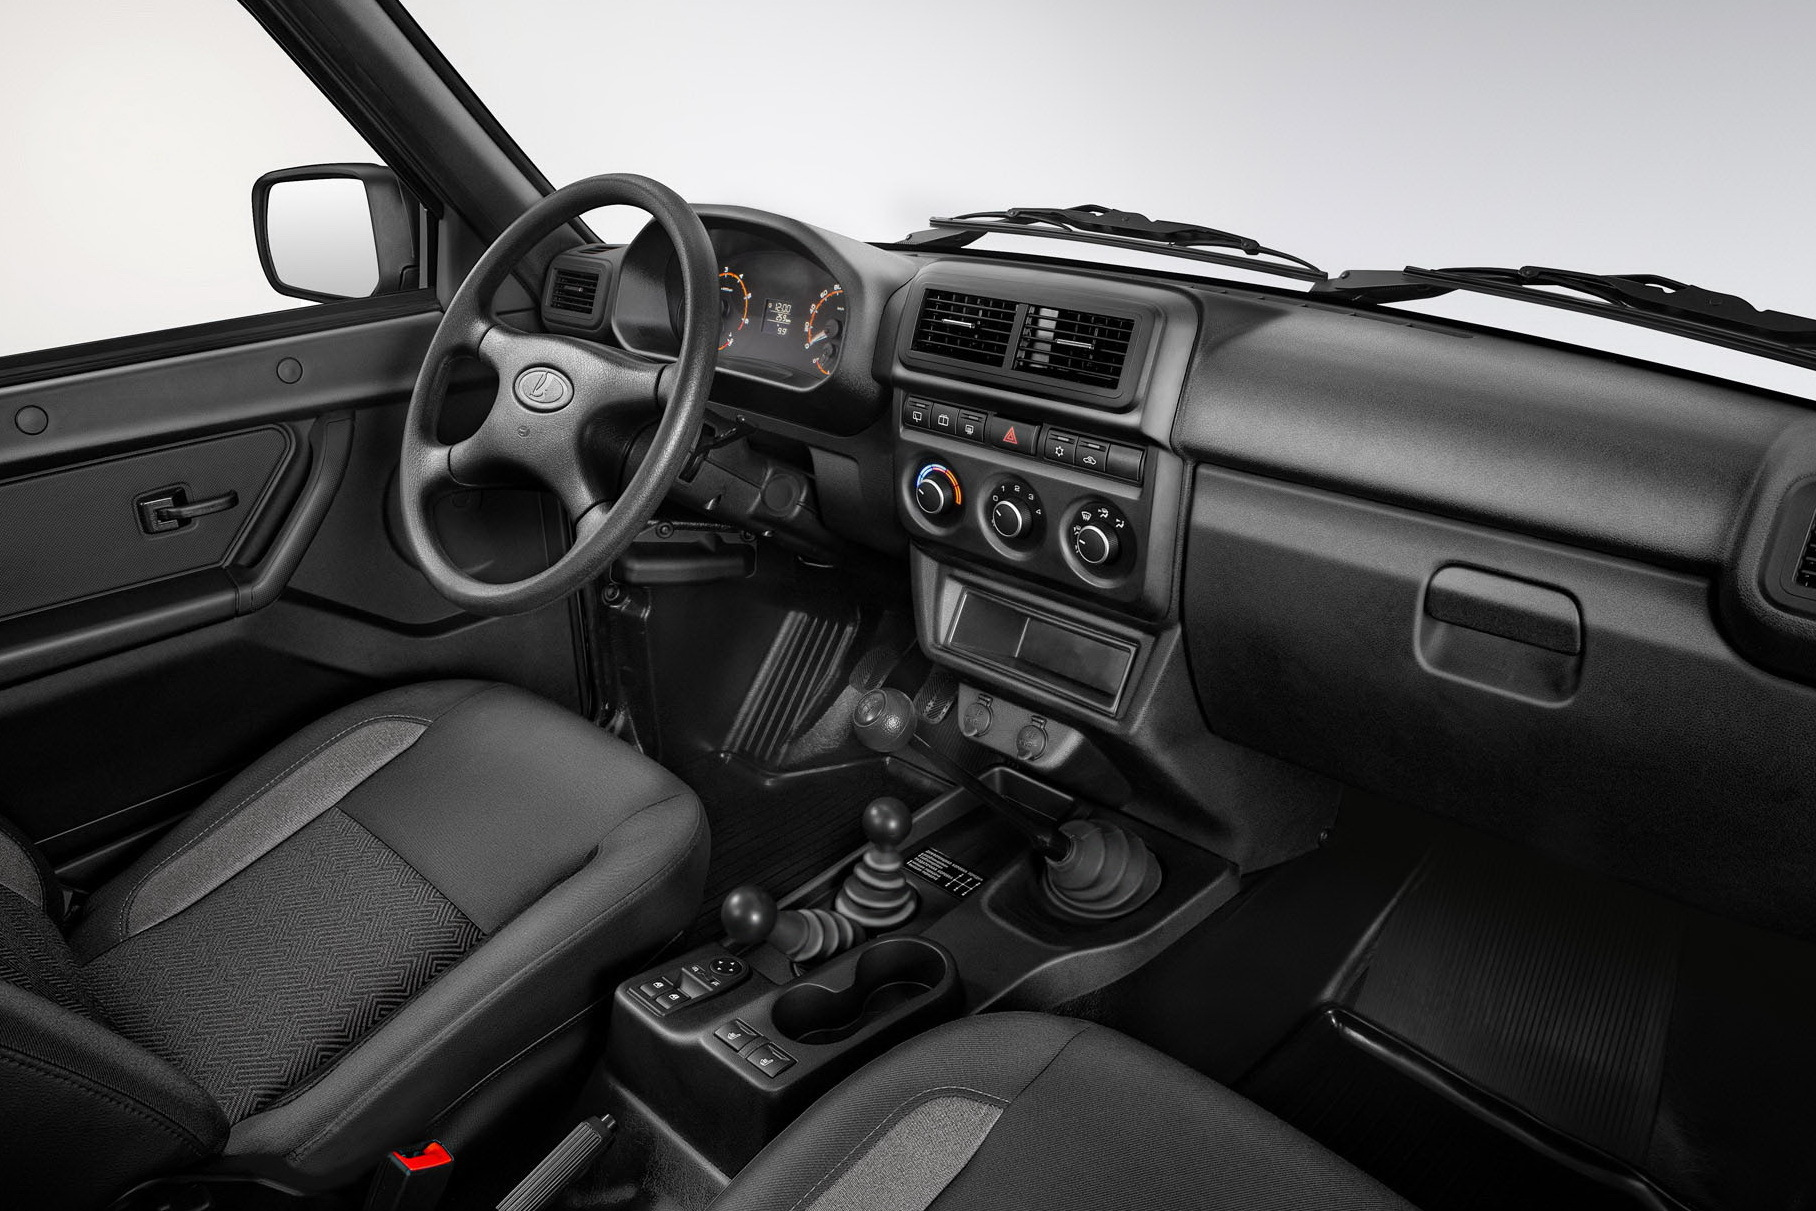 АвтоВАЗ отзовет 15 тысяч Lada Granta и Lada 4x4